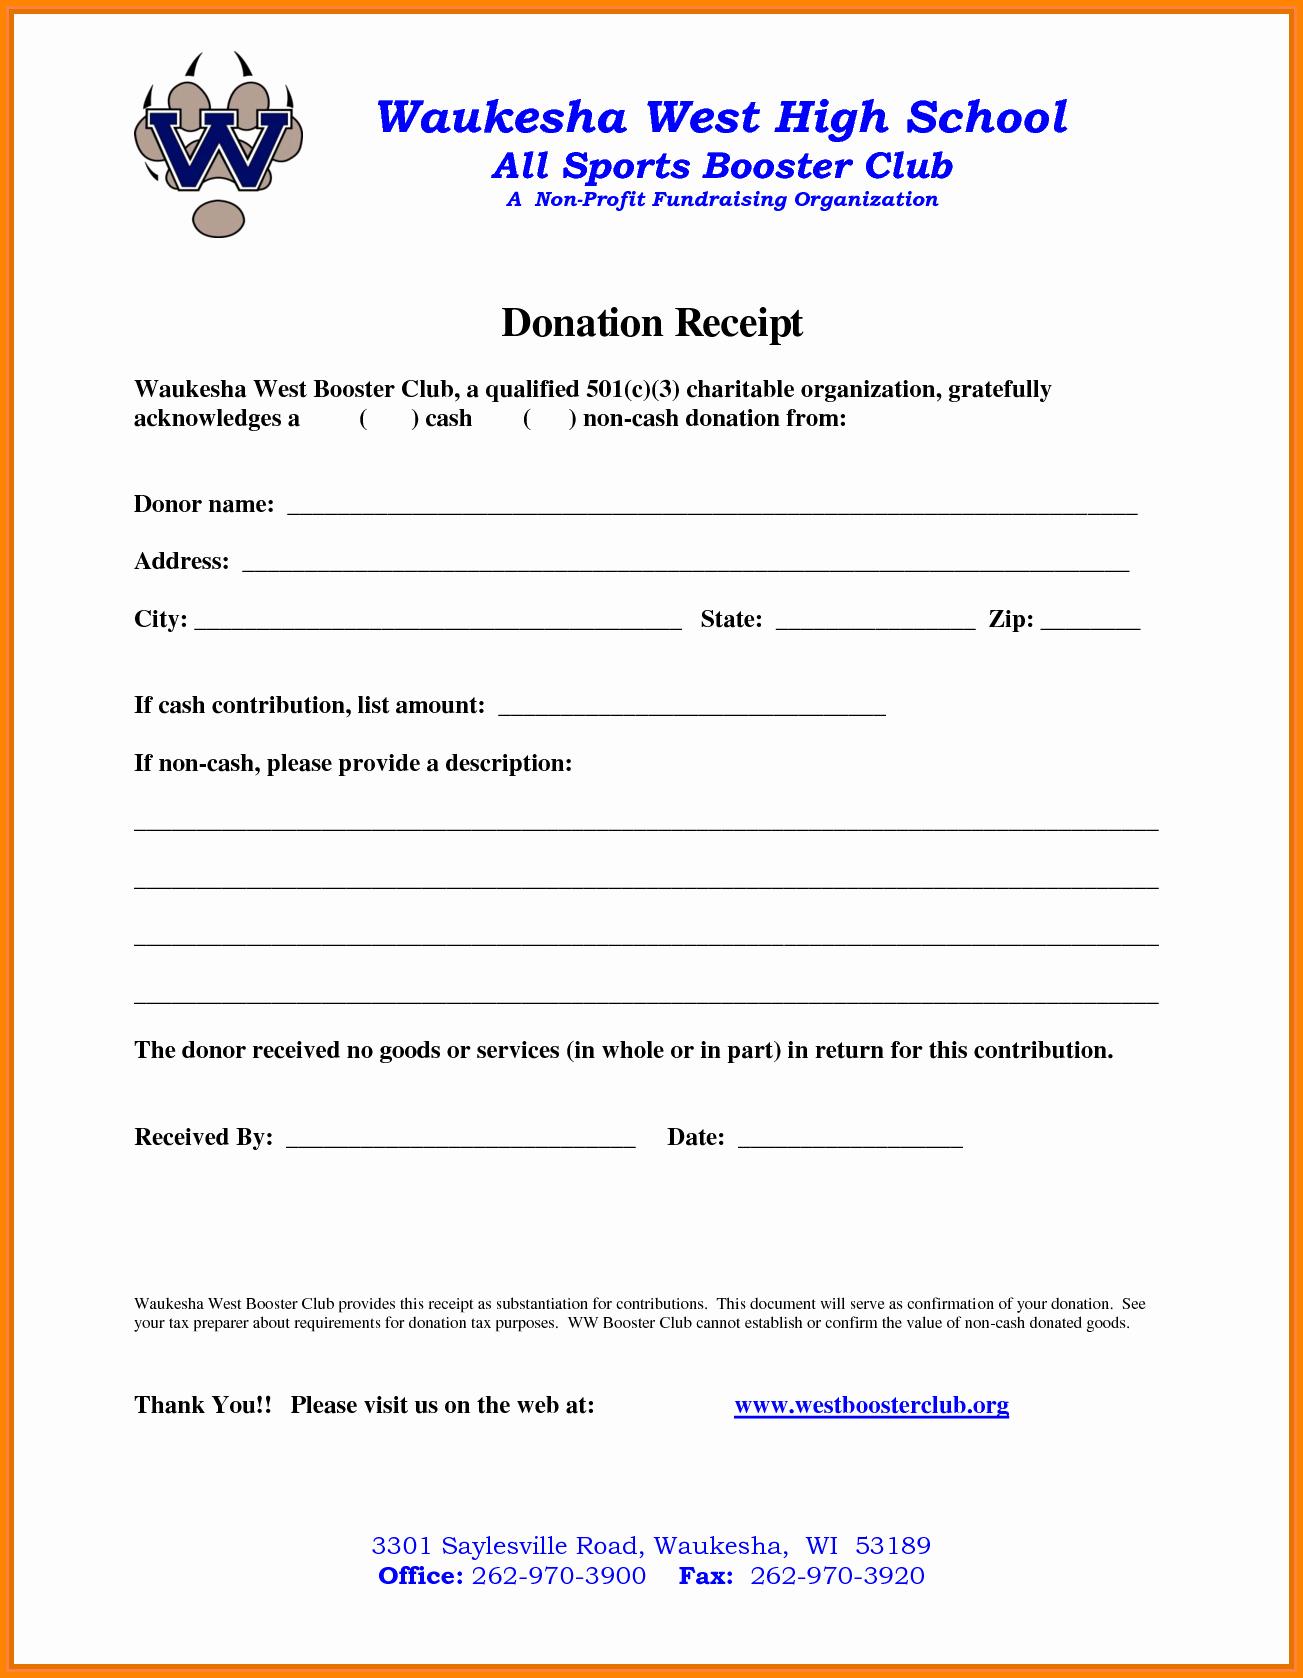 Donation Receipt Letter Template Elegant 9 Non Profit Donation Receipt Template